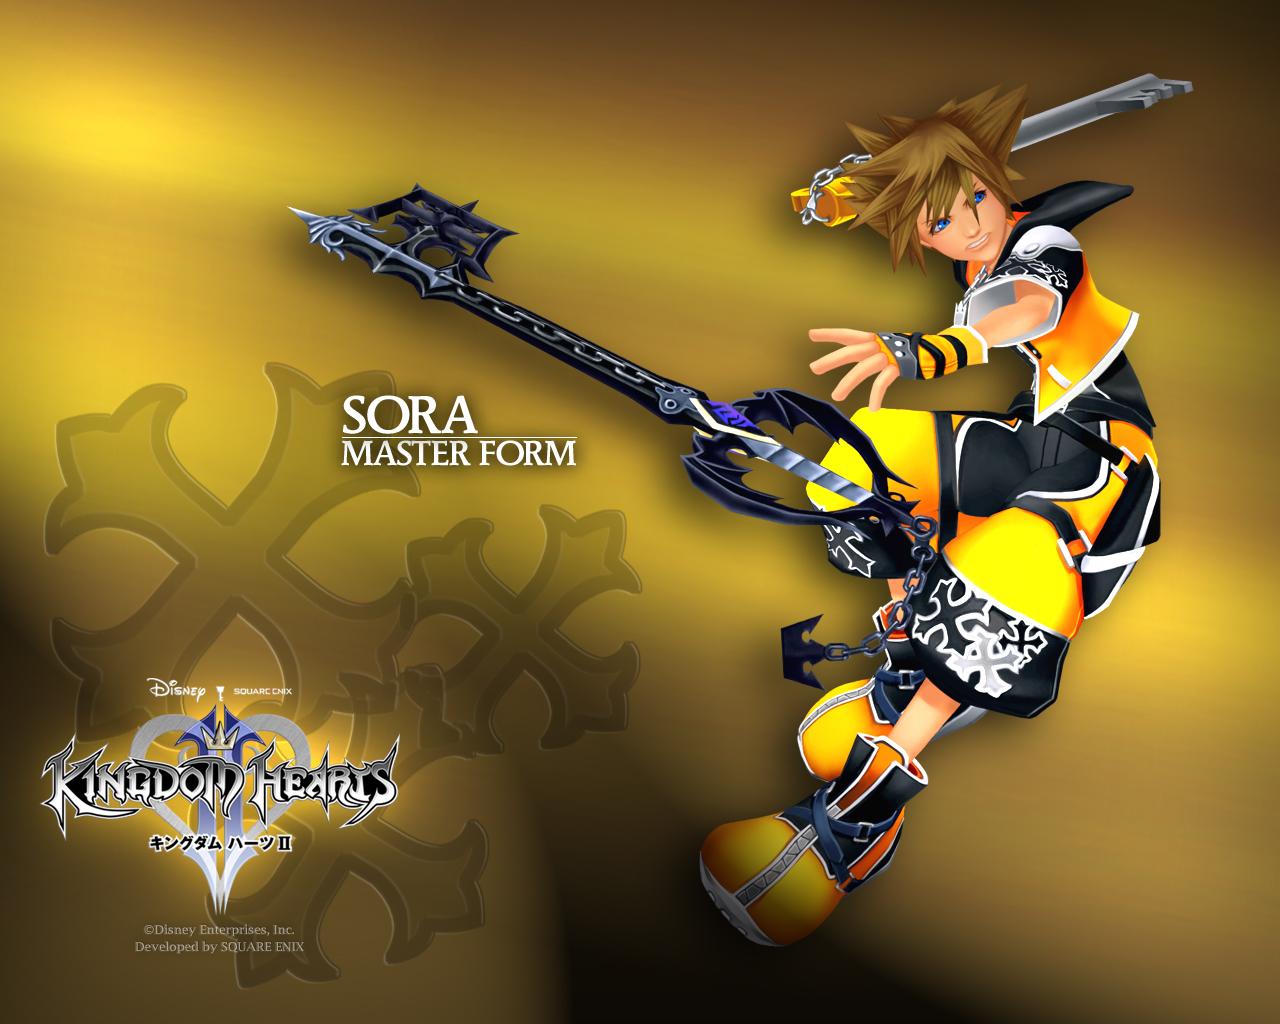 kingdom hearts sora master keyblade Kh2 form desktop 1280x1024 ...